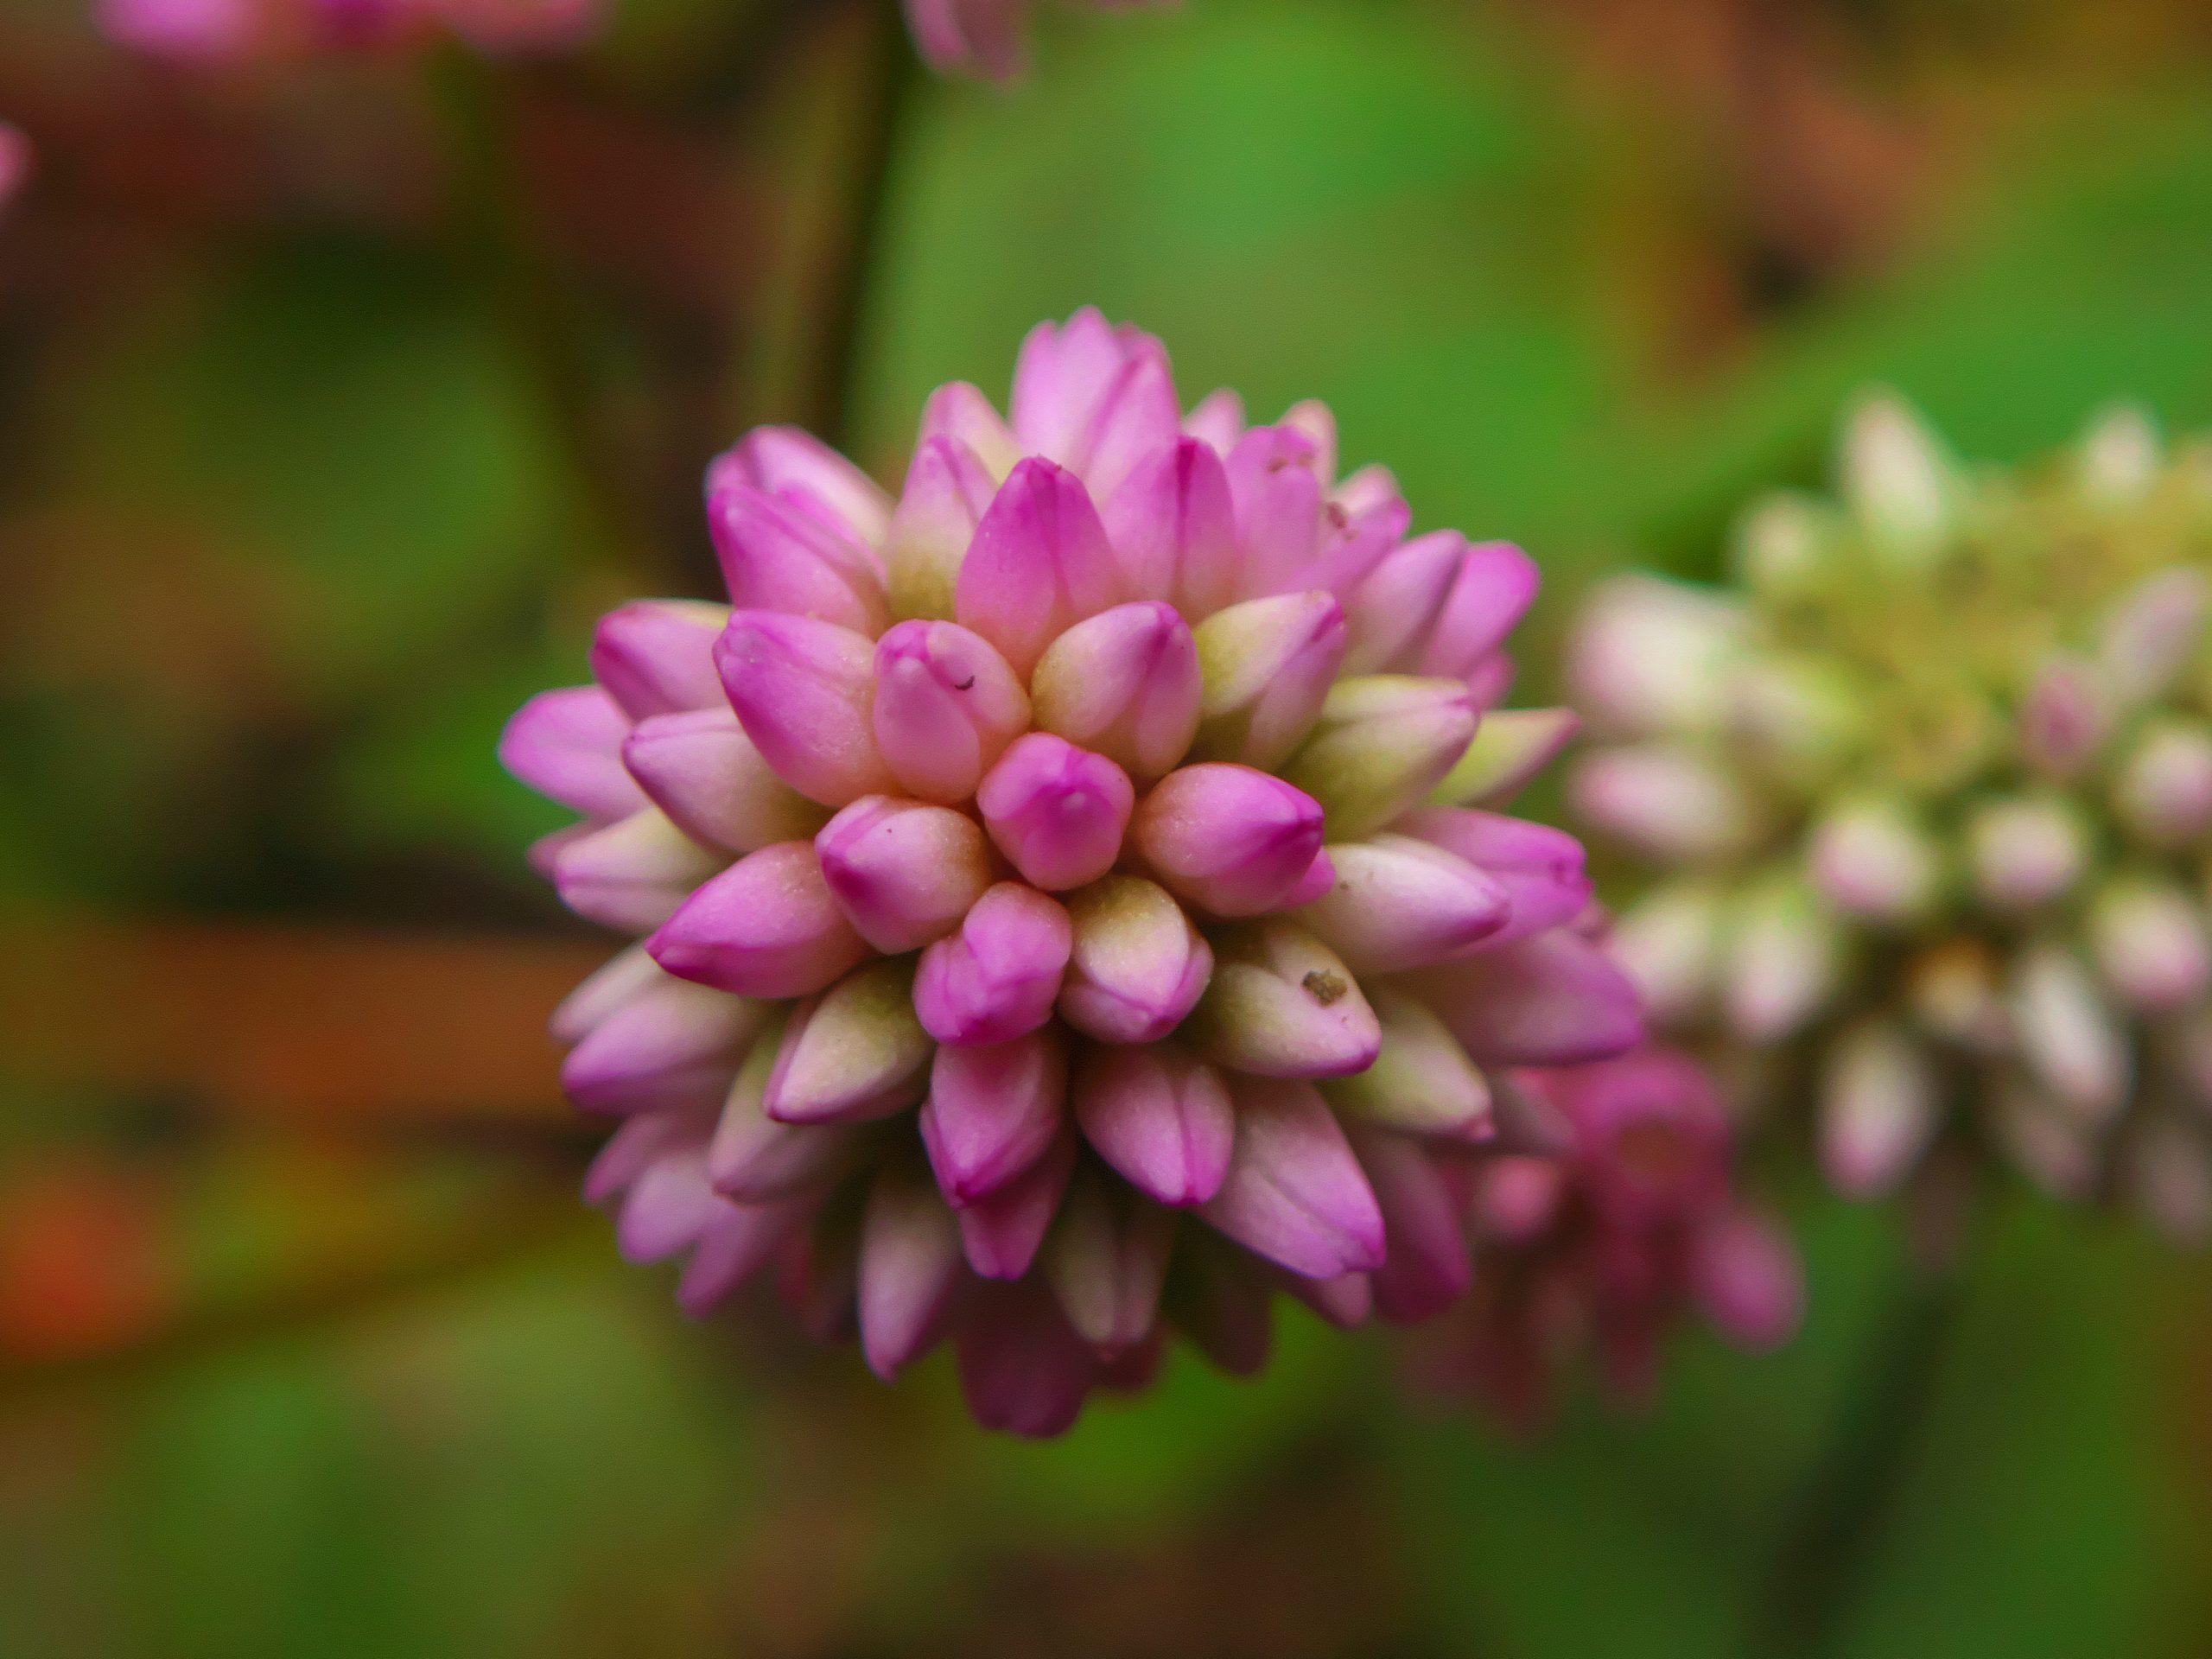 【SONY】この季節に咲く花(12)